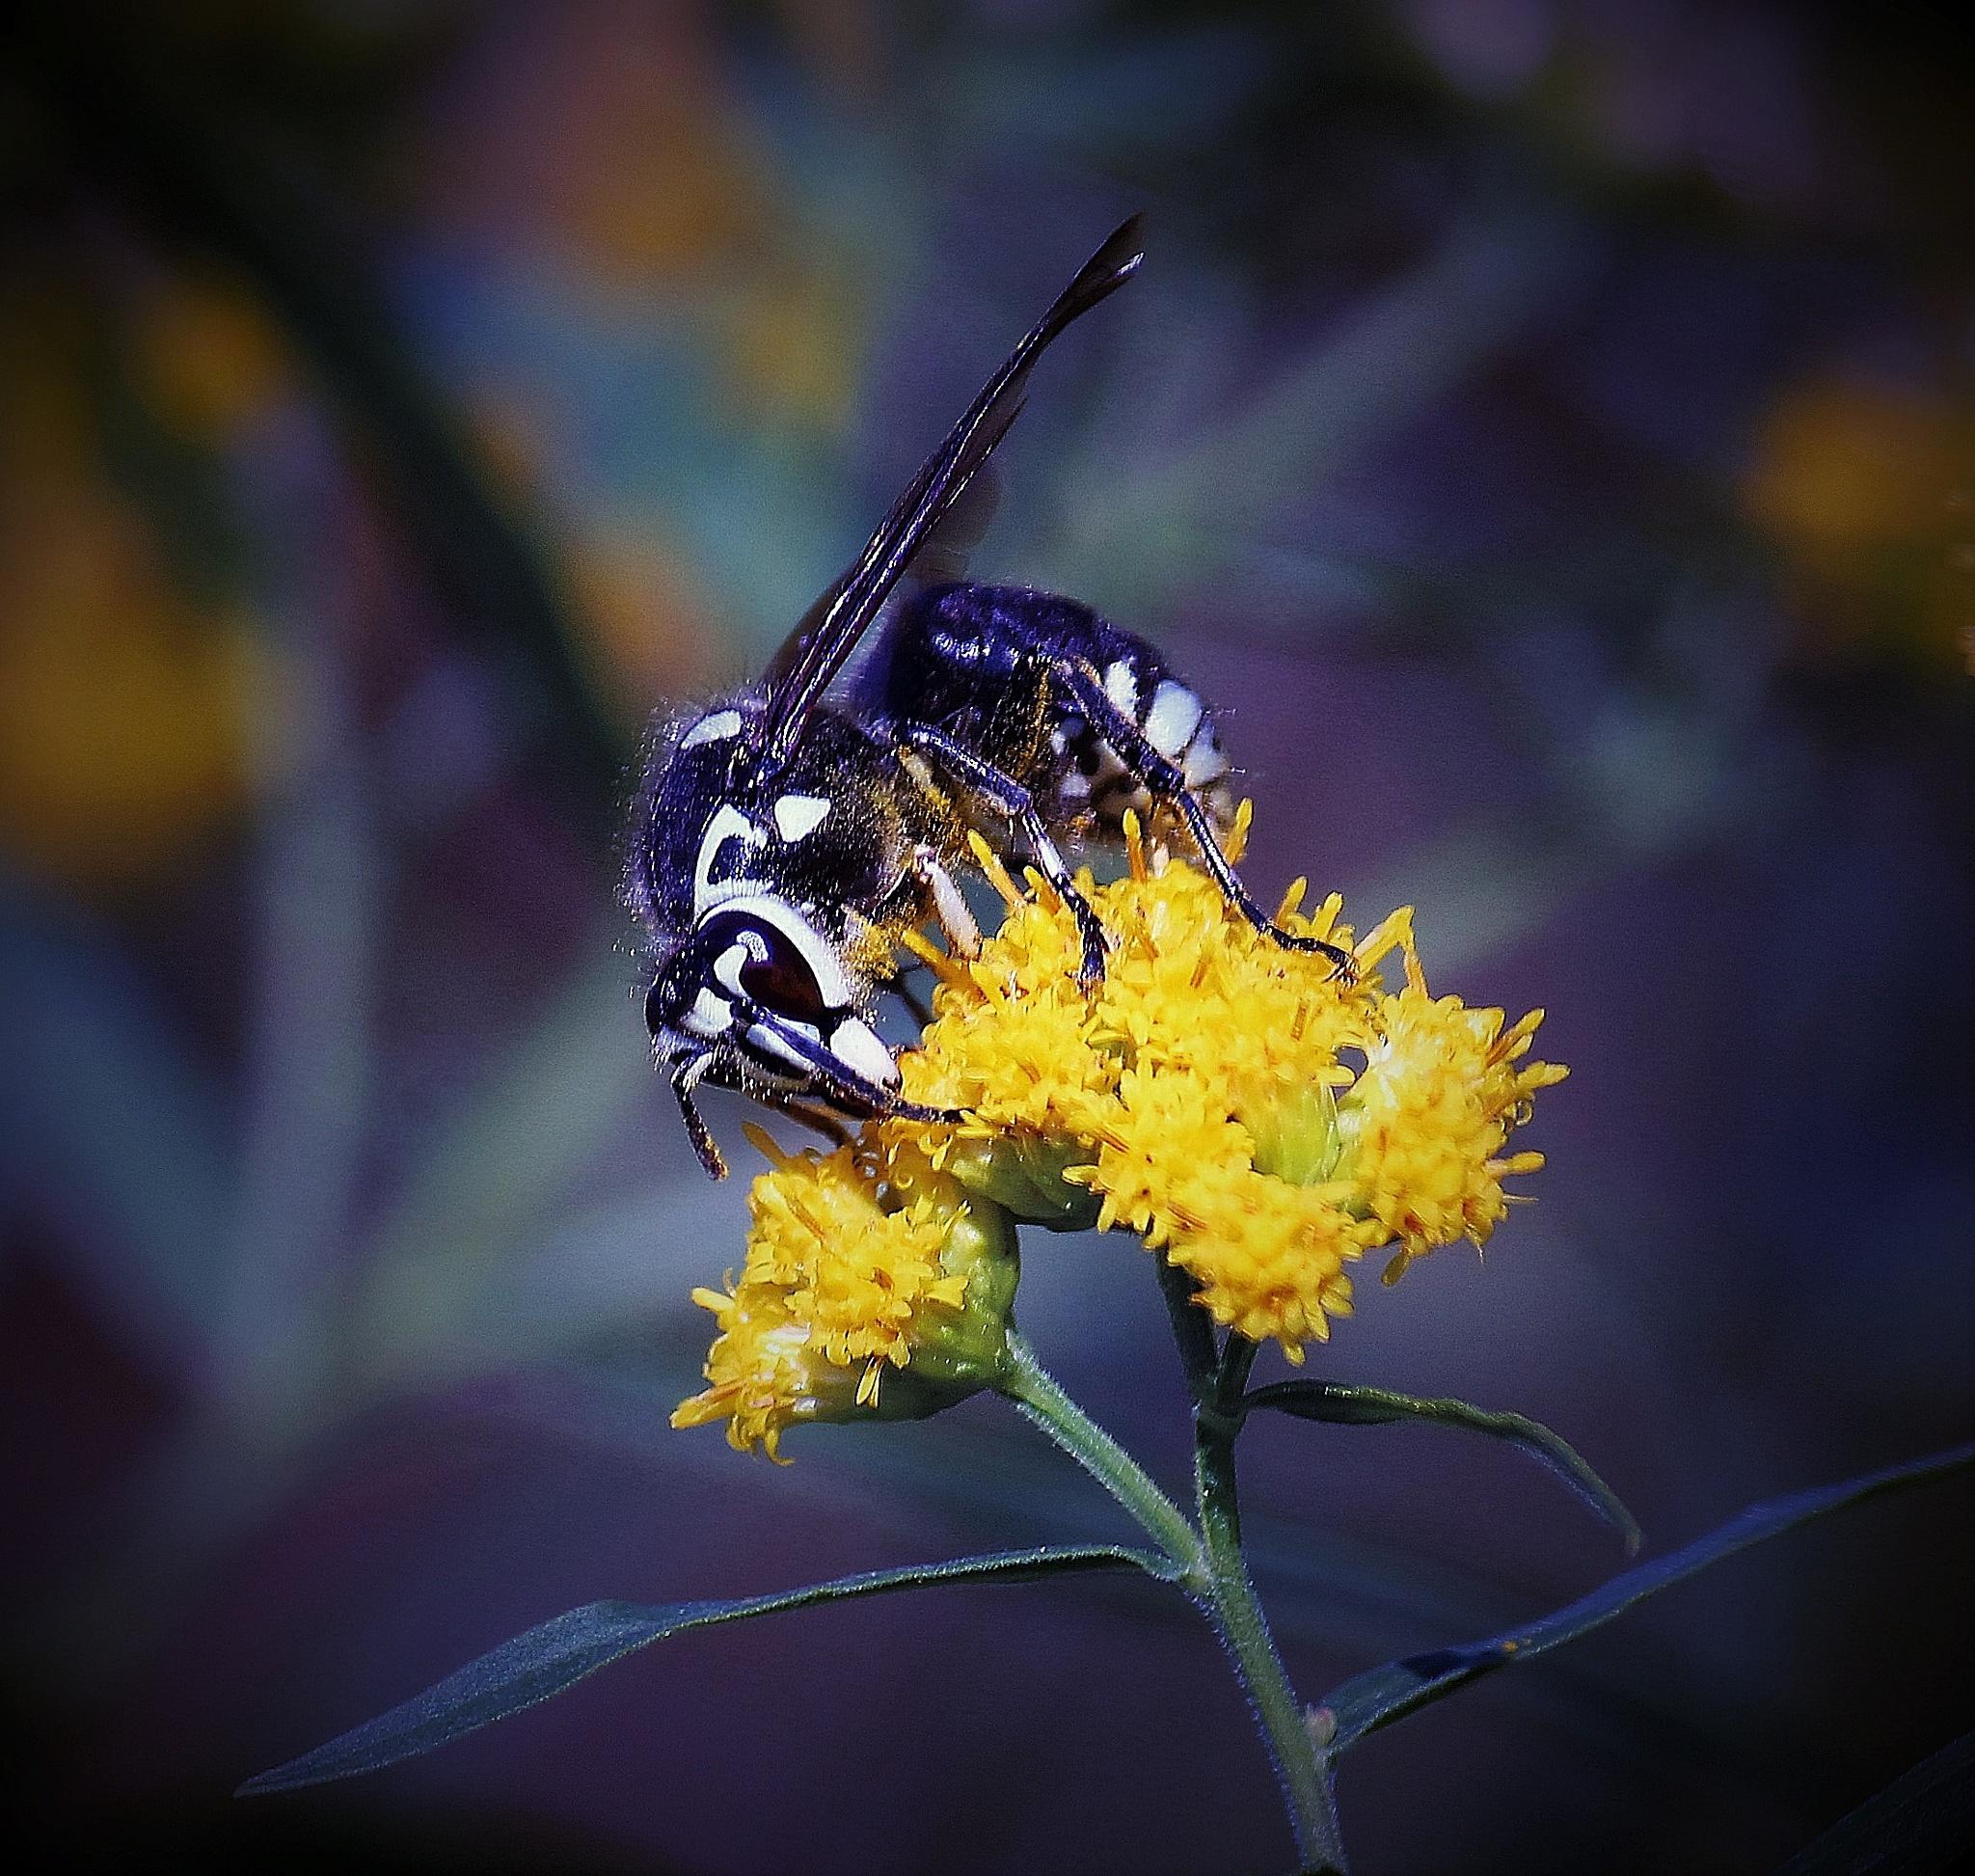 """Whats the buzz?"" by Sue Delia"